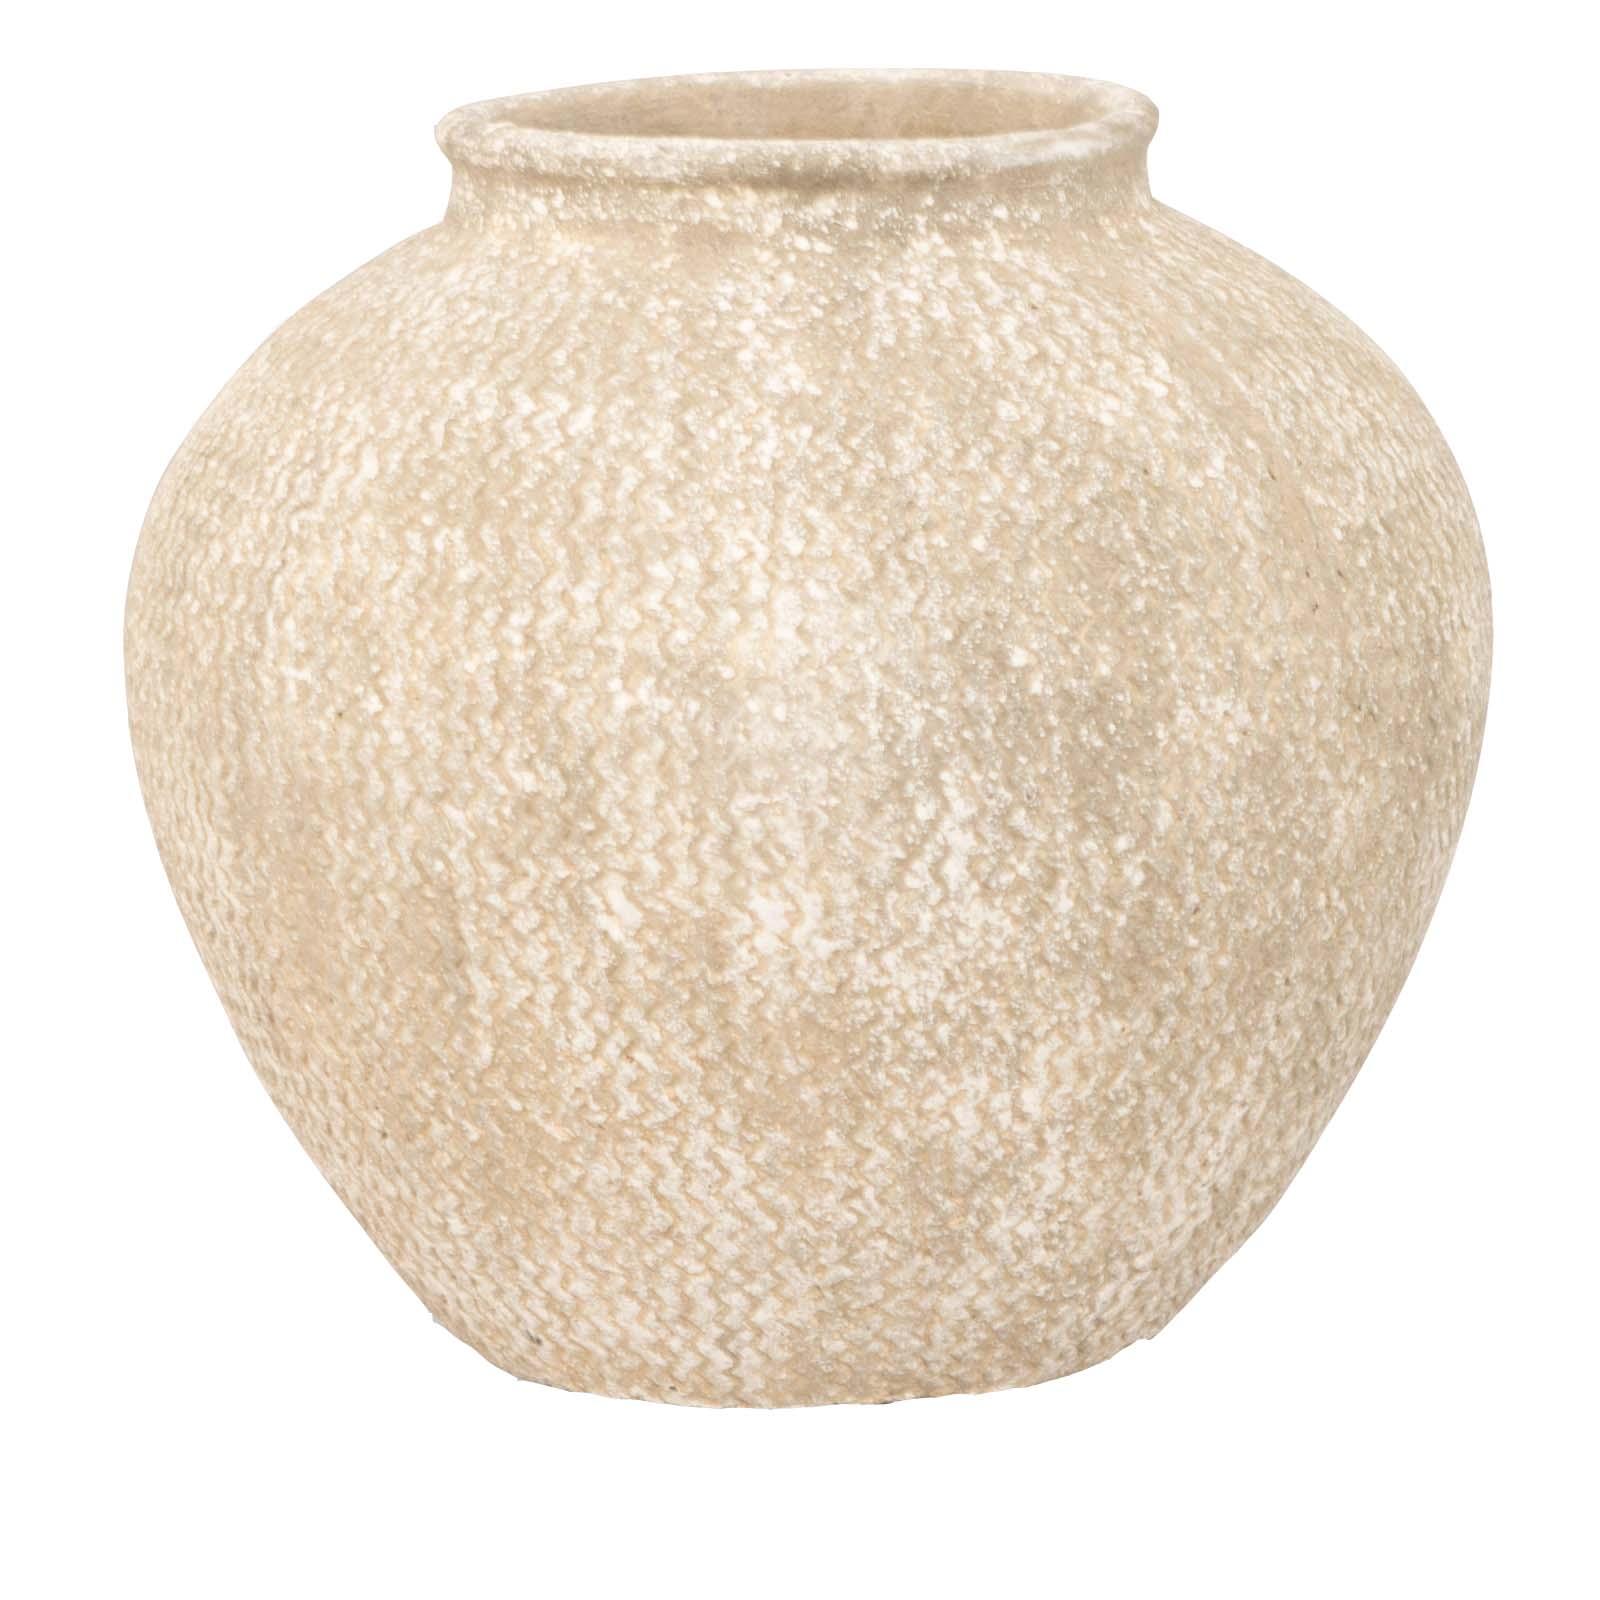 Ludlow Etched Rounded Stone Vase 1